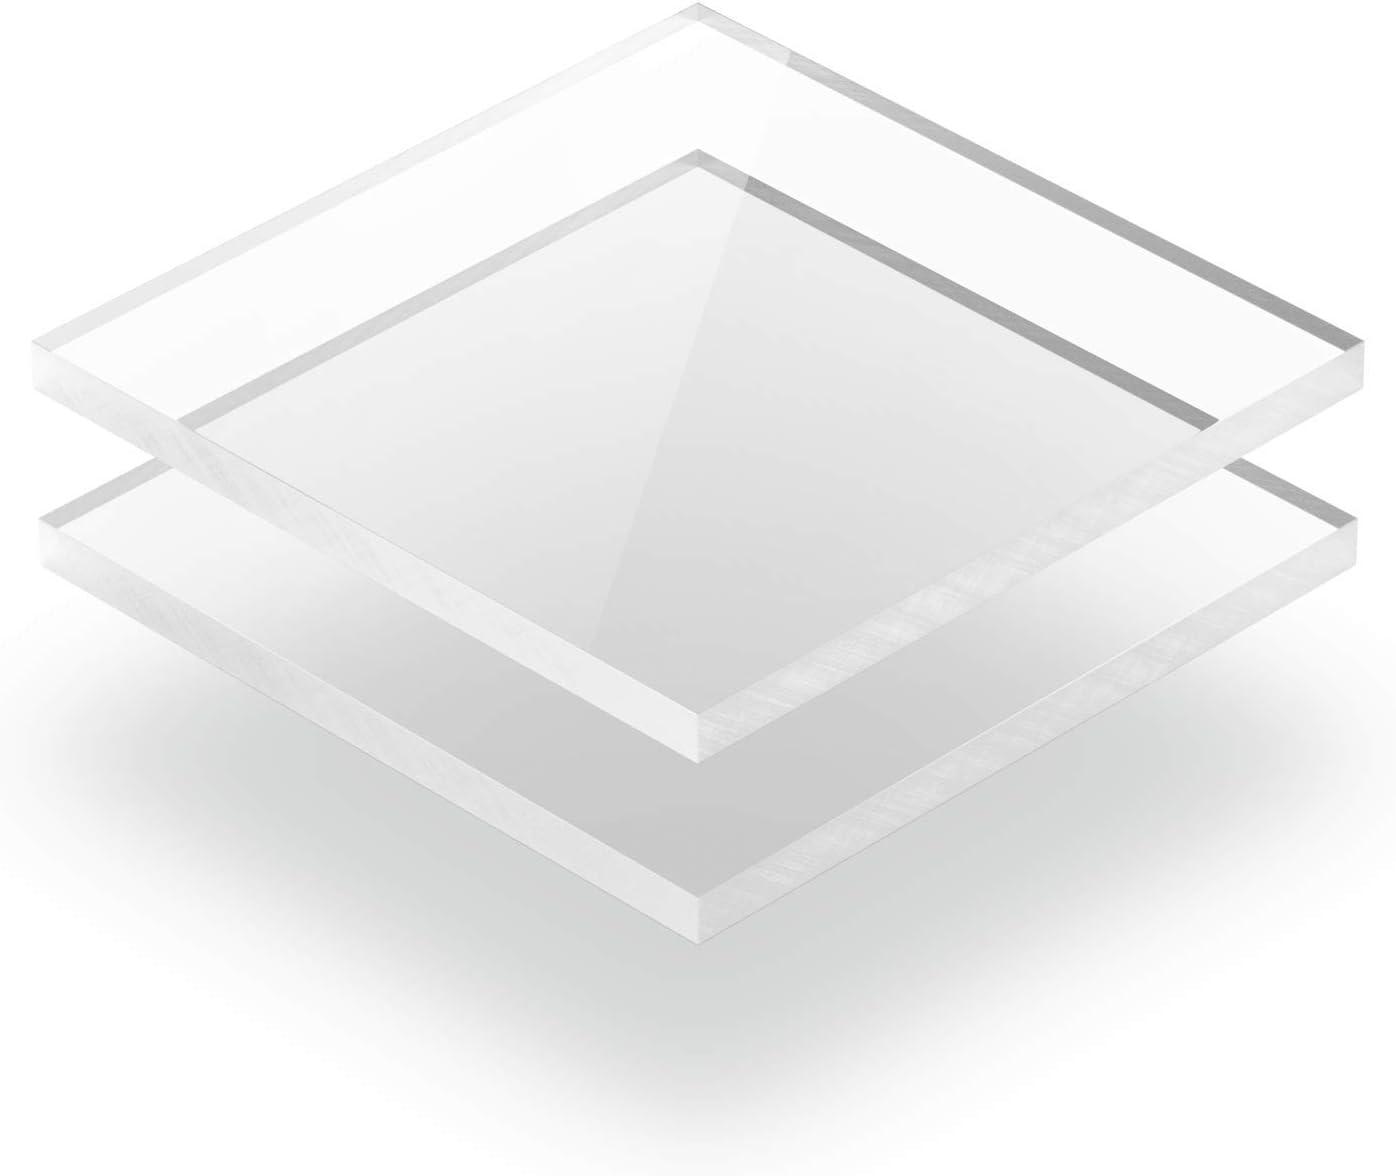 40 x 10 cm 400 x 100 mm Kunststoffplattenonline.de Acrylgas XT Platten//Acrylglasplatten XT Transparent 4mm im Zuschnitt